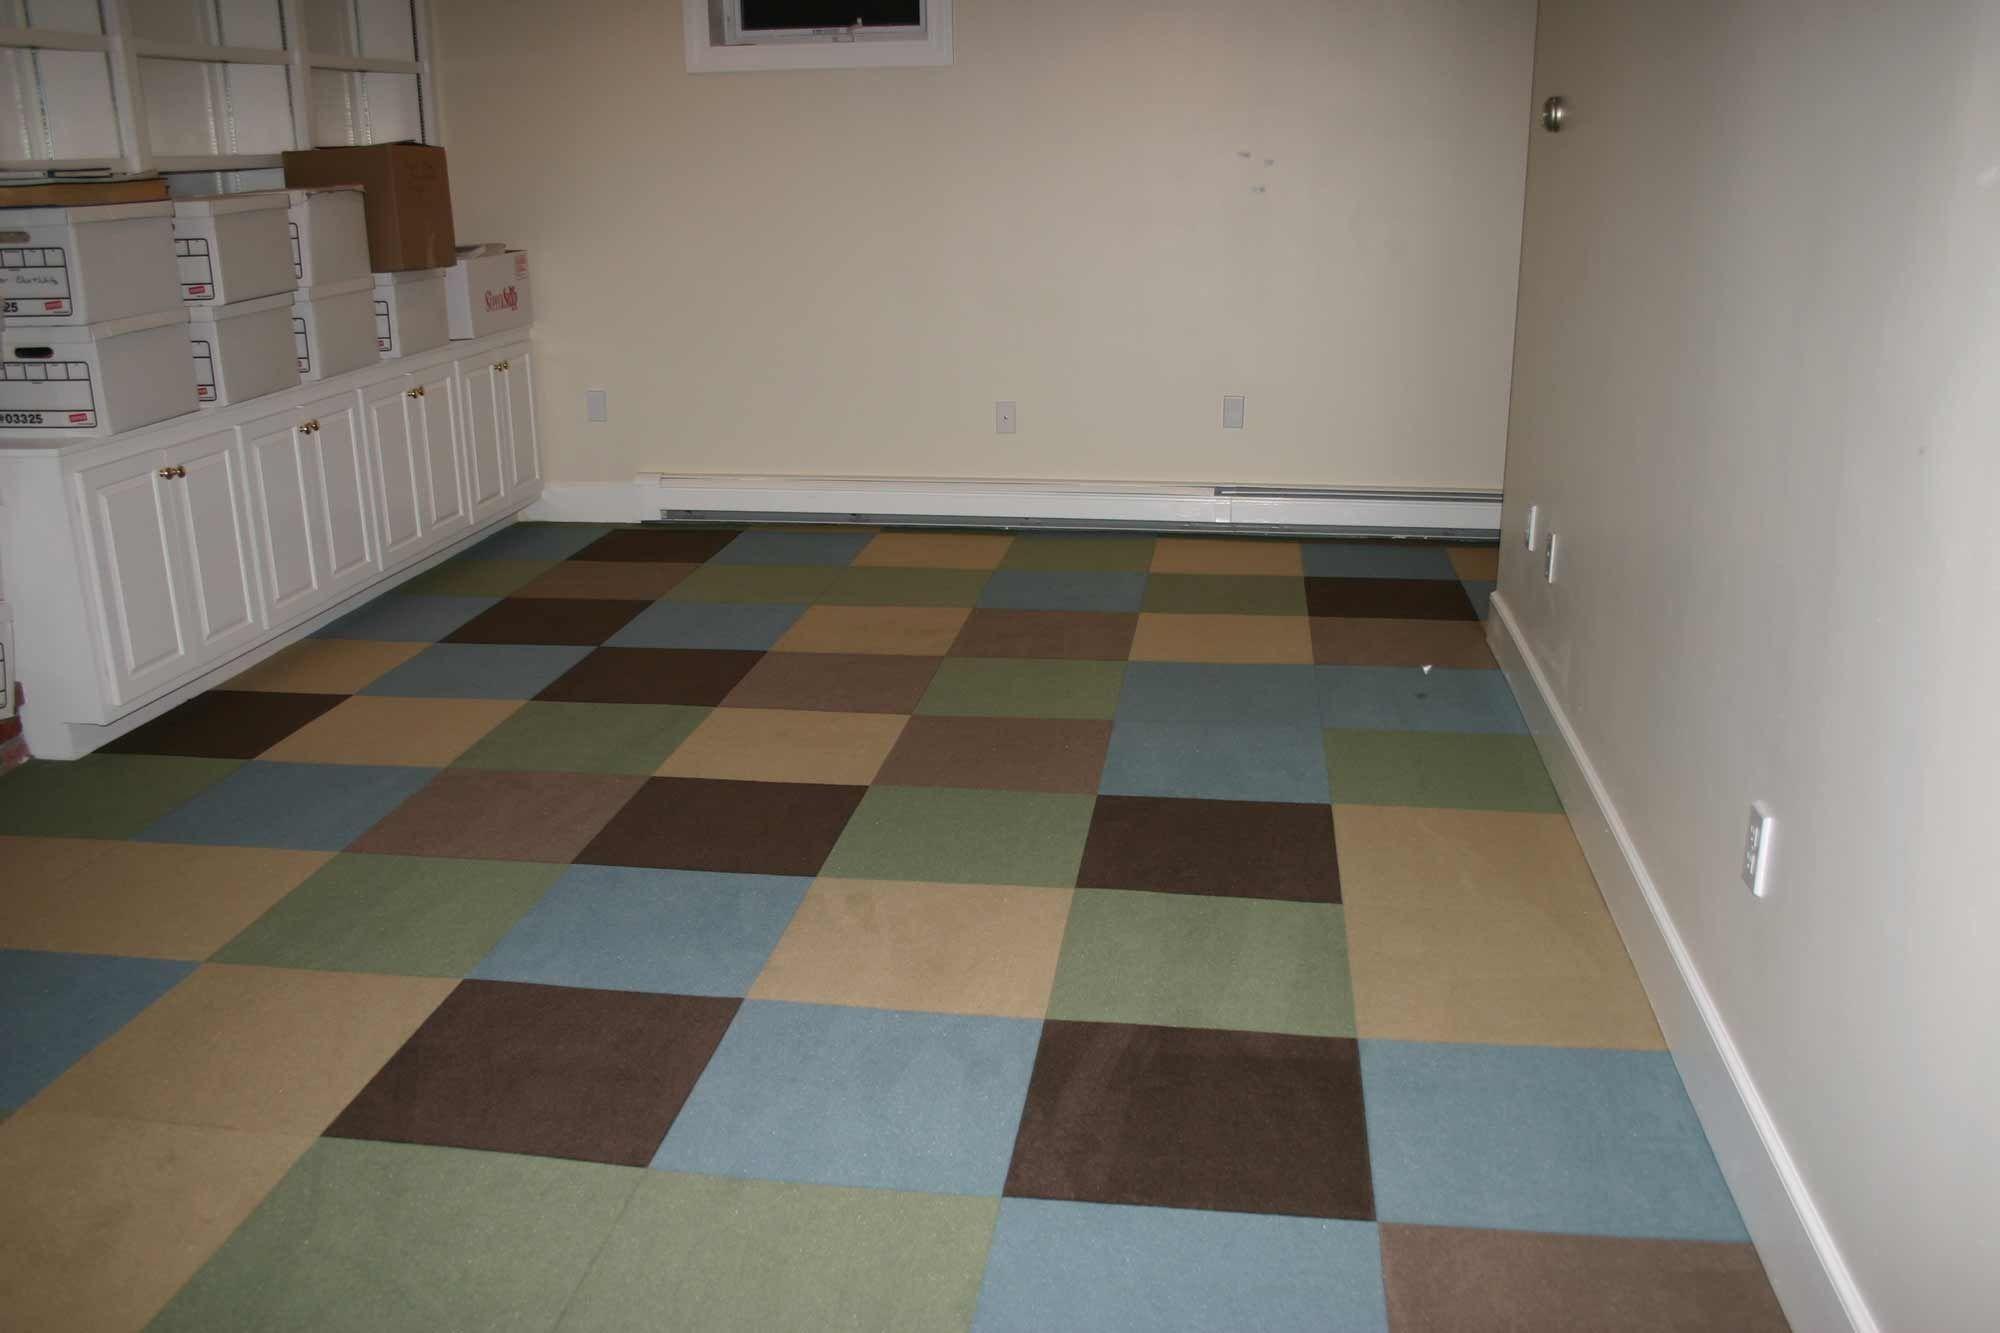 Best Flooring For Damp Cement Basement Httpdreamtreeus - What flooring is best for damp basement